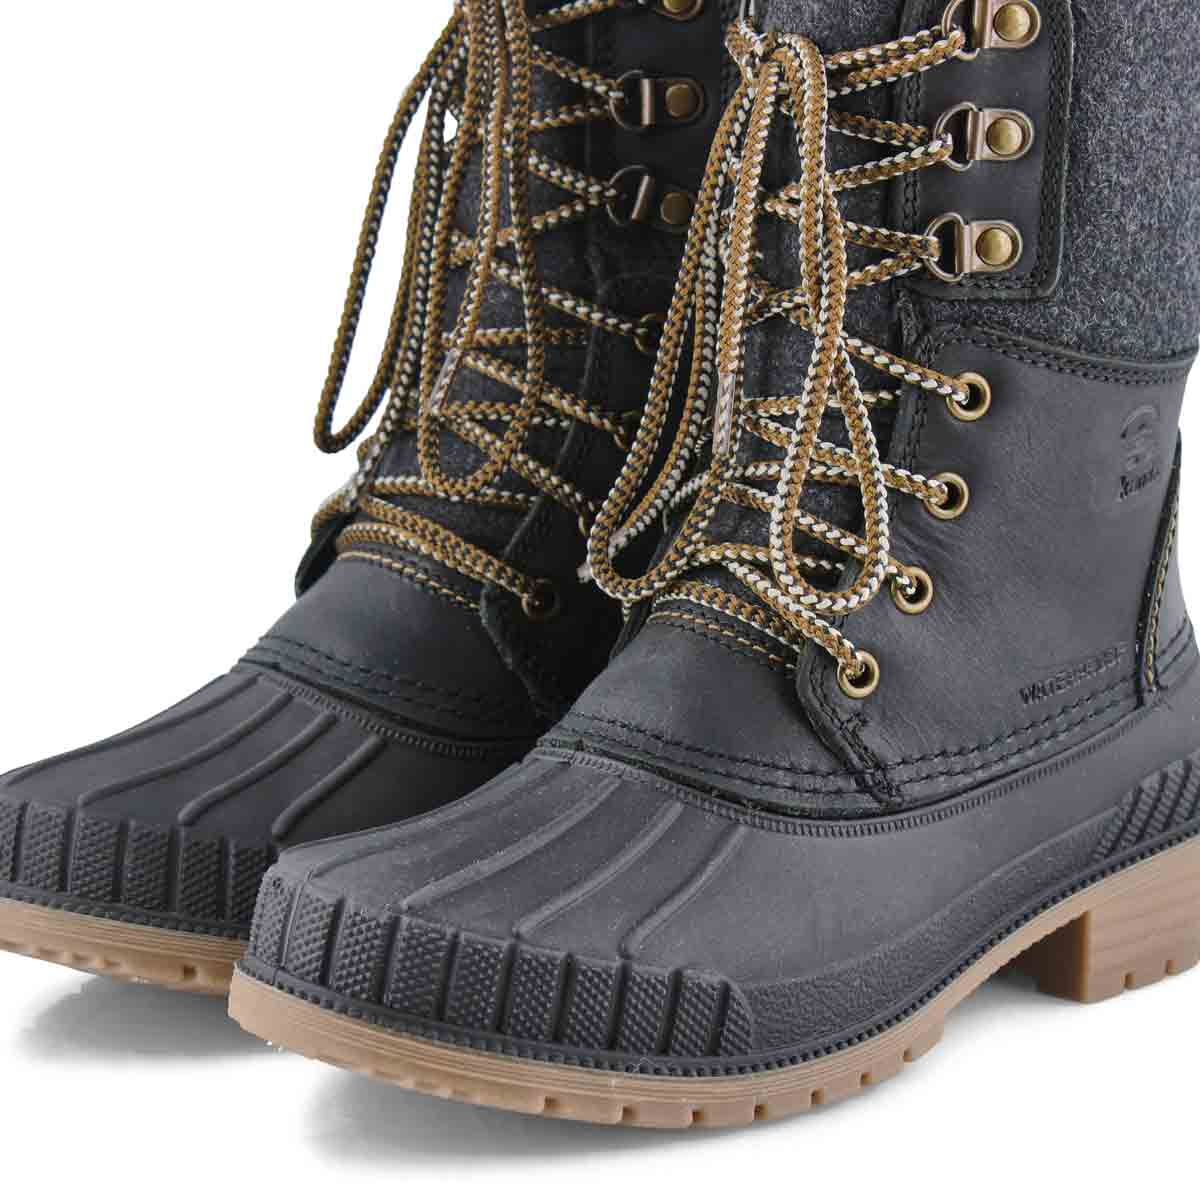 Women's Sienna 2 Waterproof Winter Boot - Black